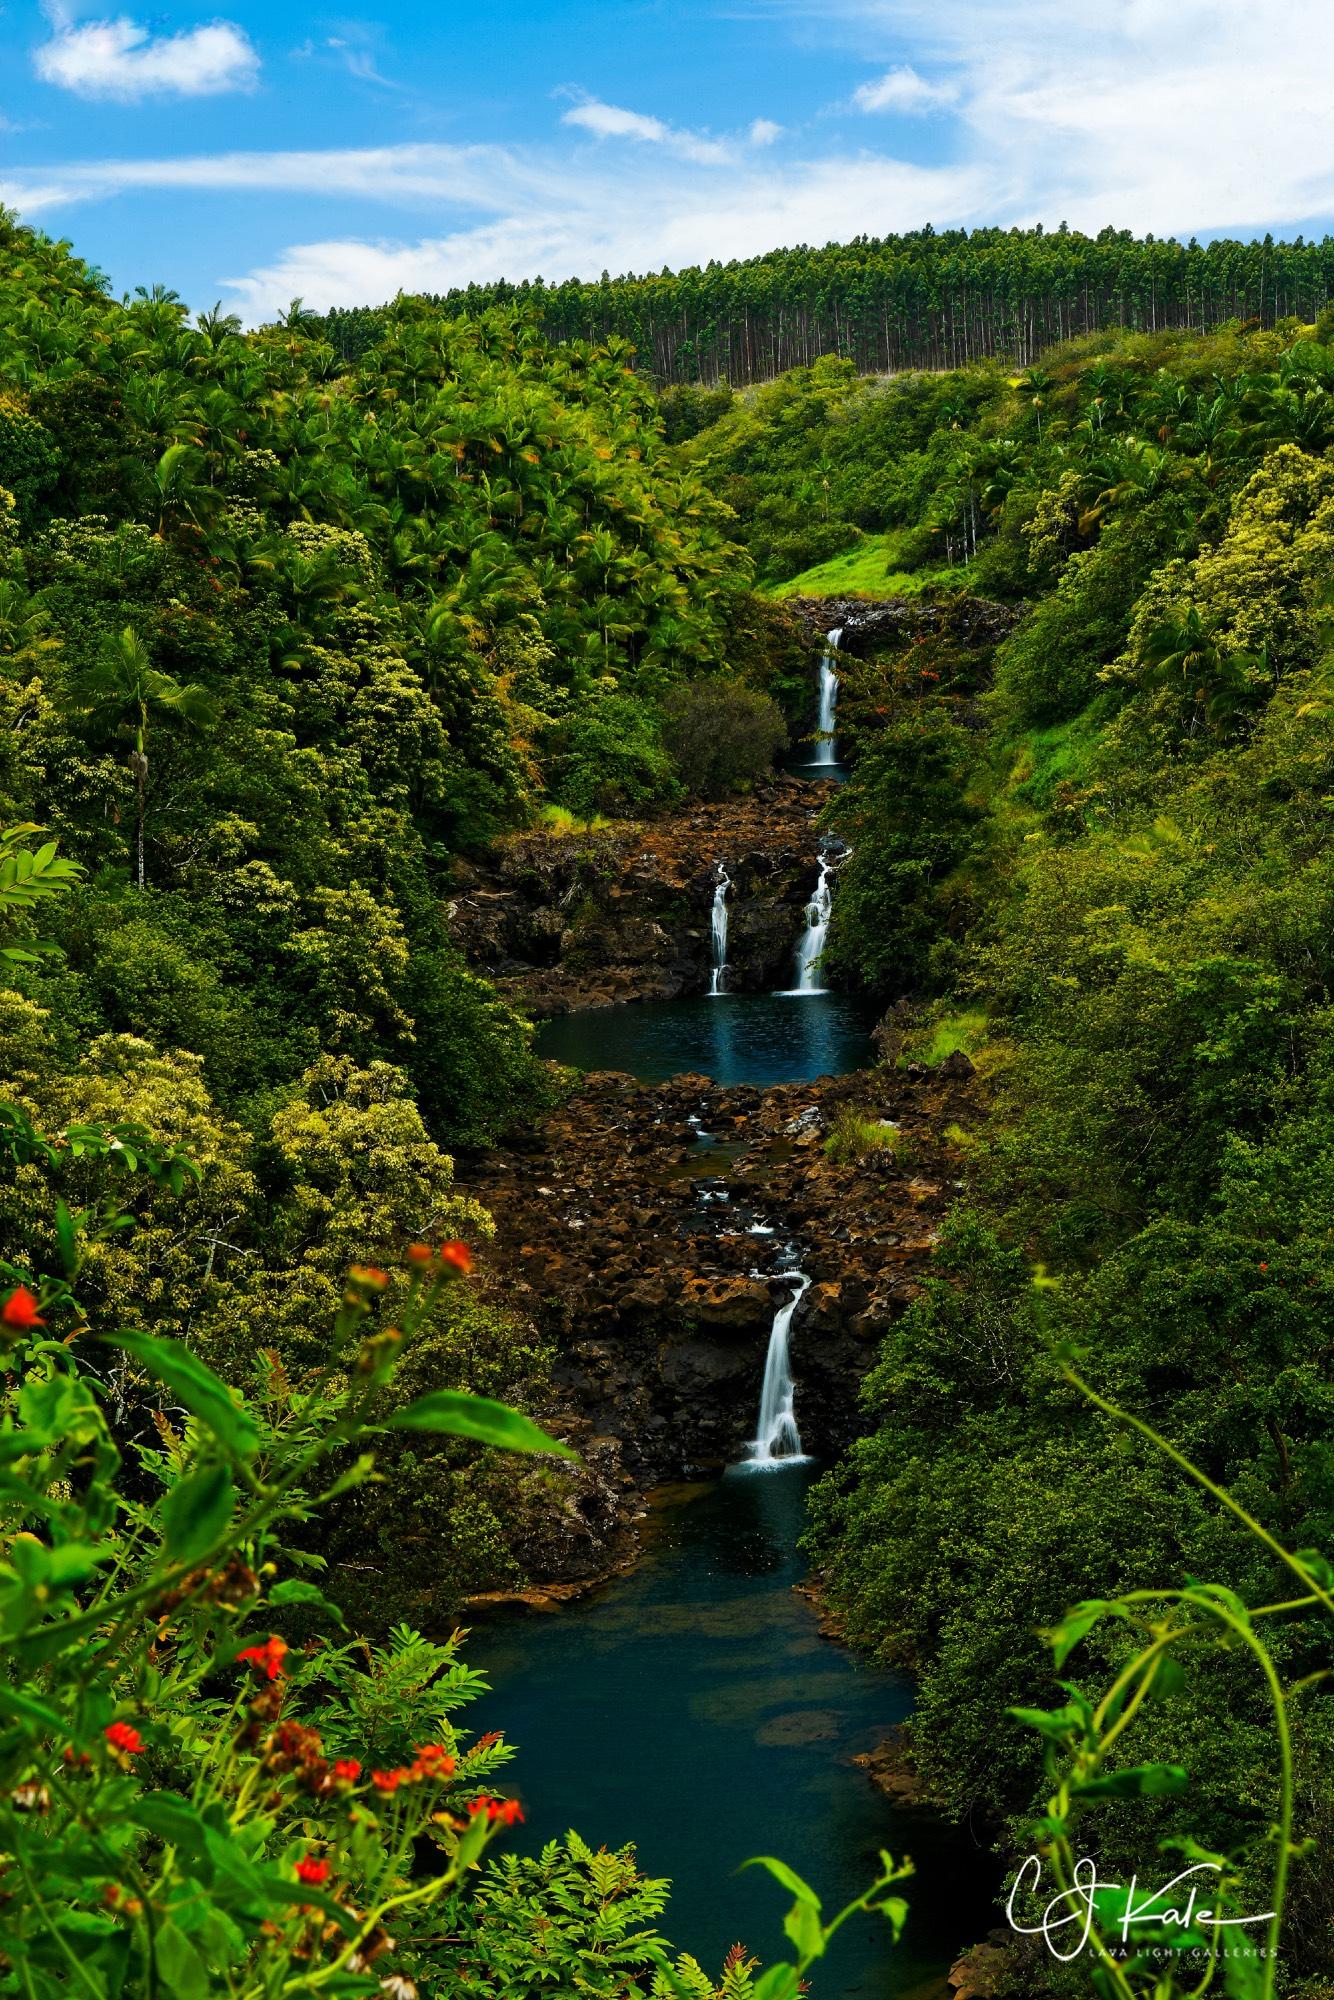 Big Island waterfall.